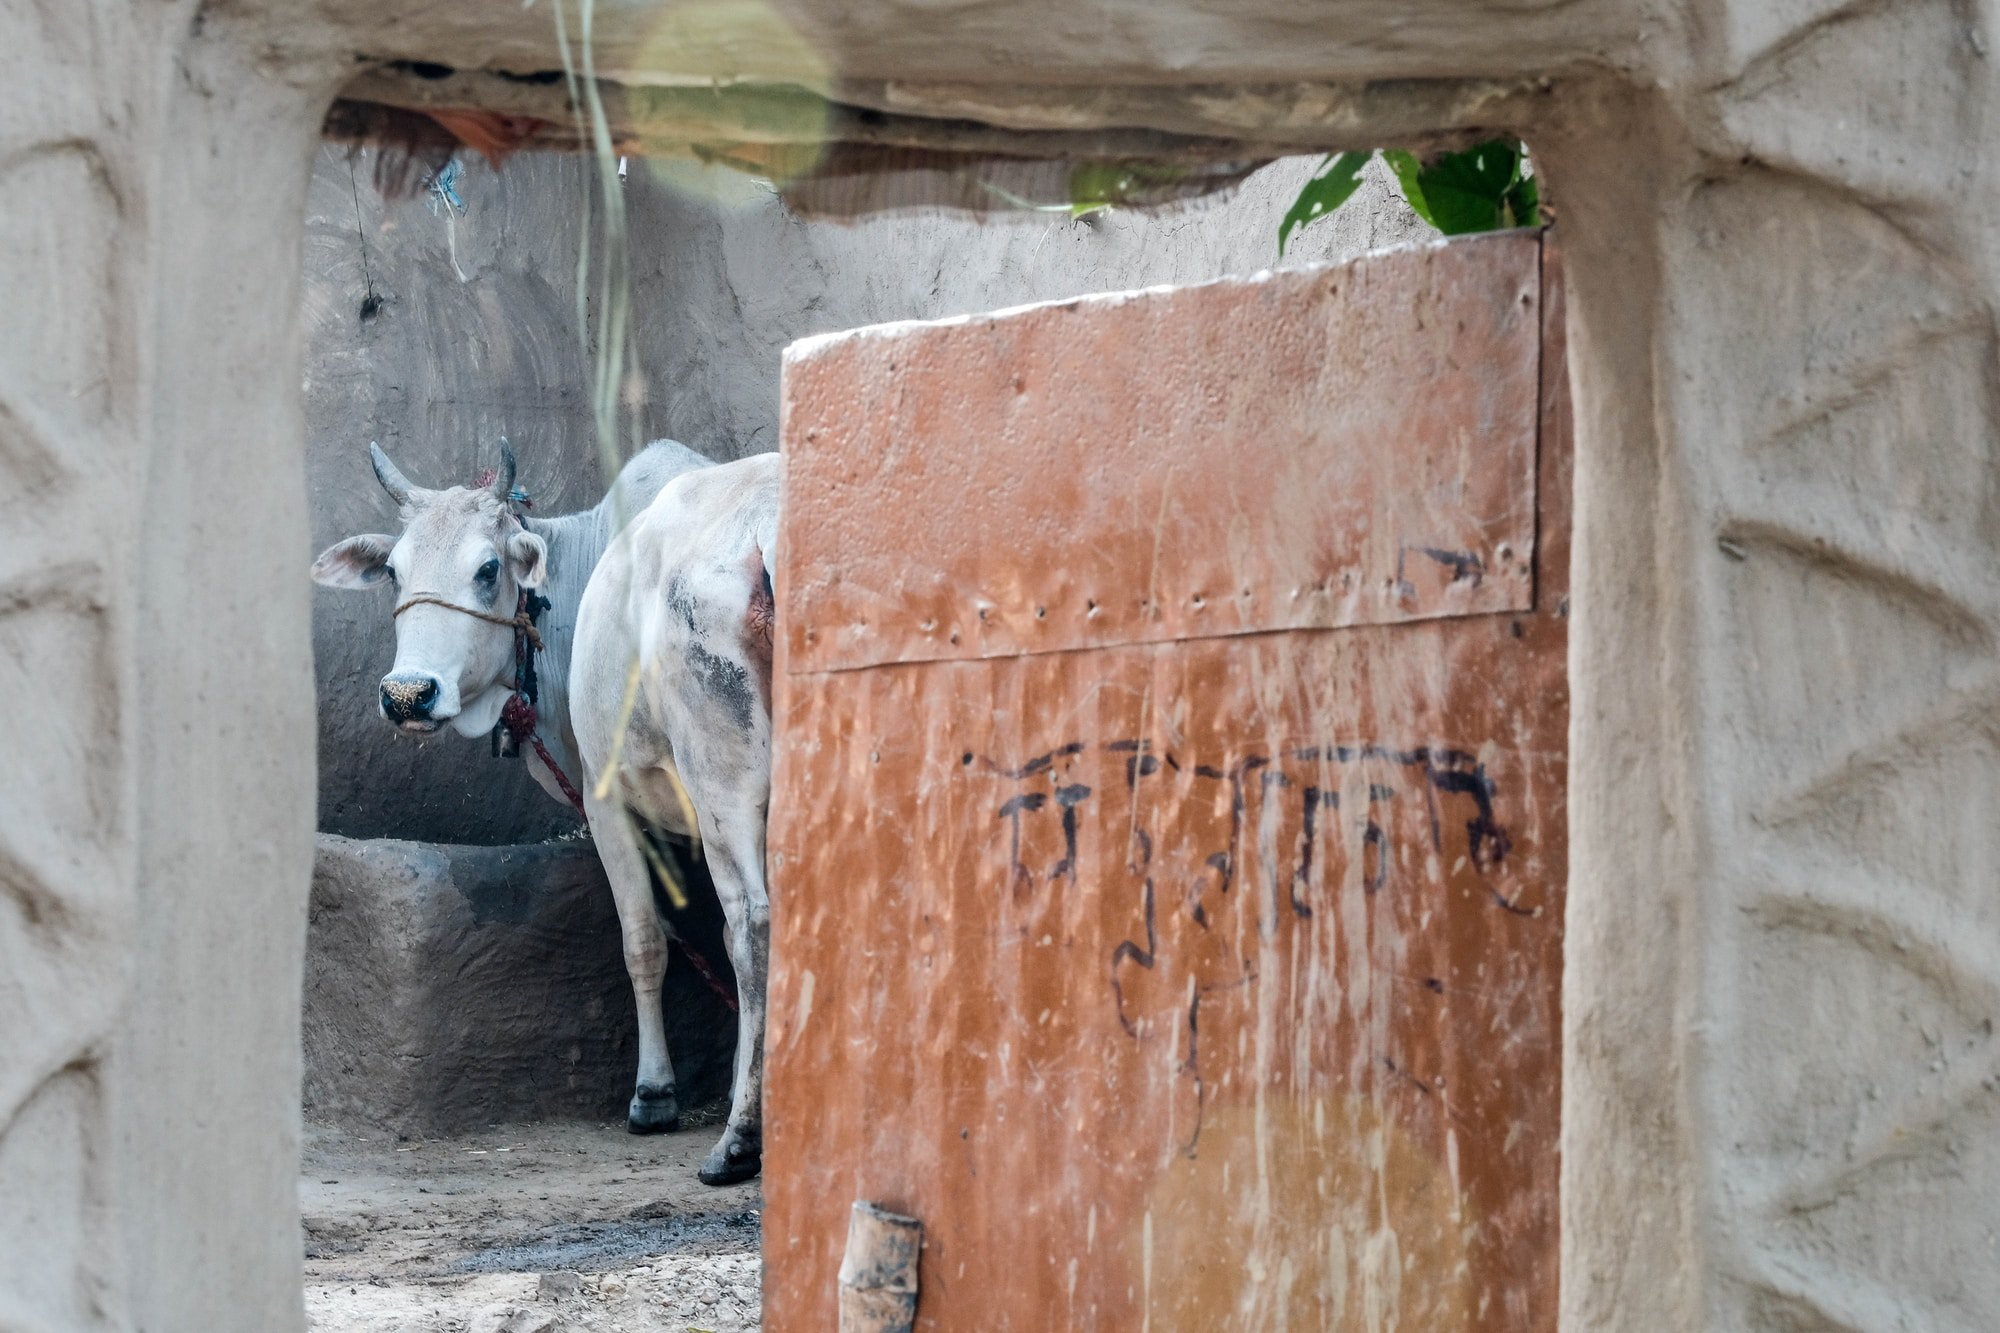 Cow inside a mud hut in remote village, Uttar Pradesh, India